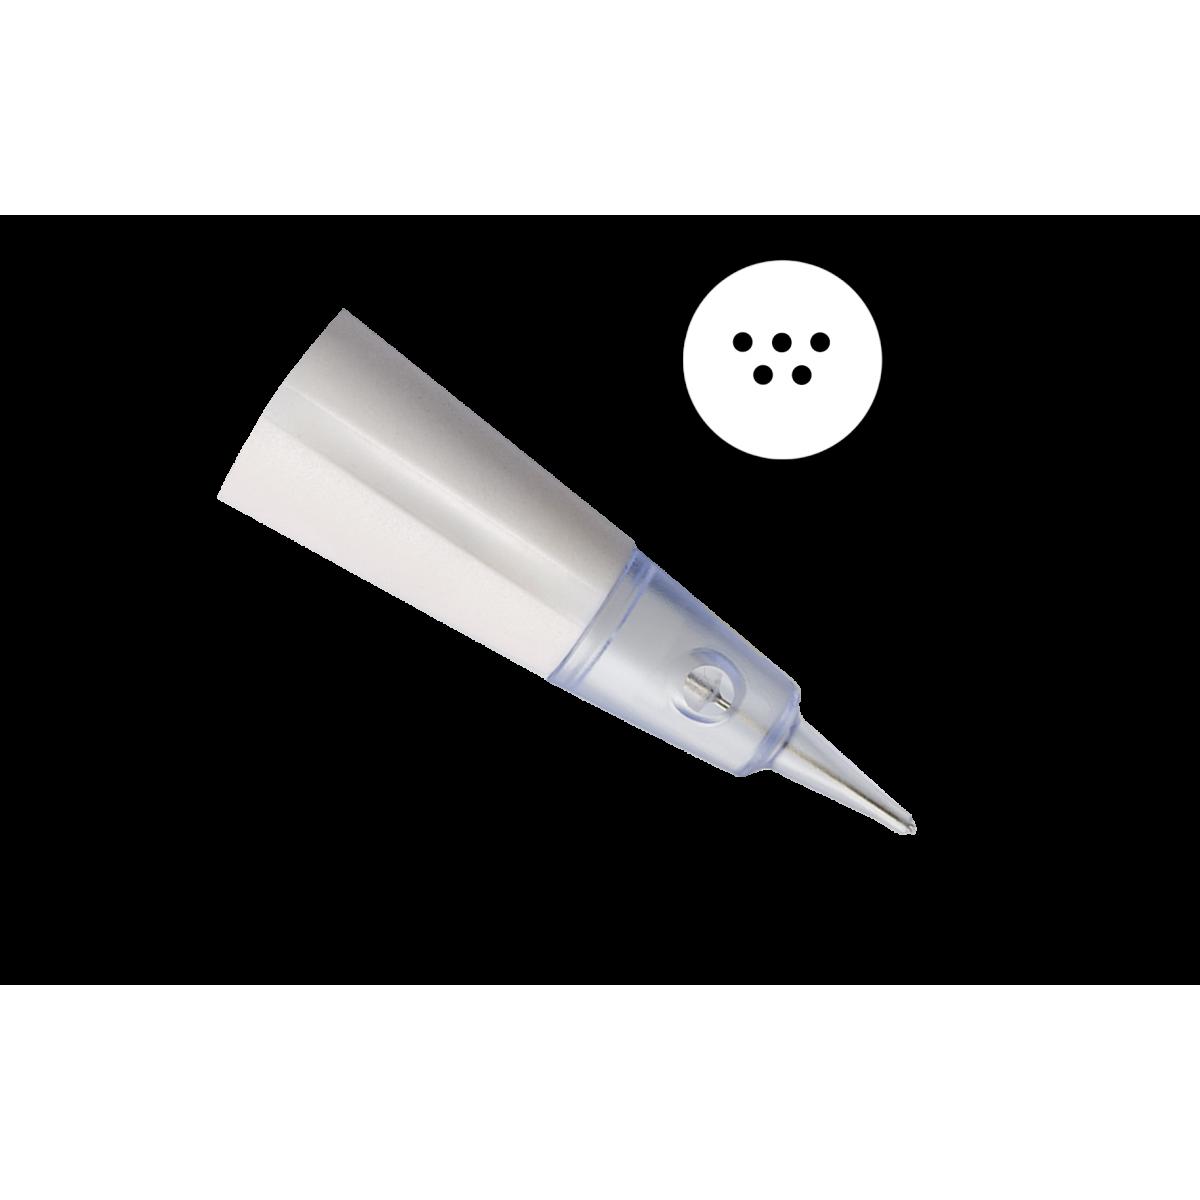 POUR GENIUS - MODULE 5 NANO SPREAD (0,25 mm) GENIUS AMIEA